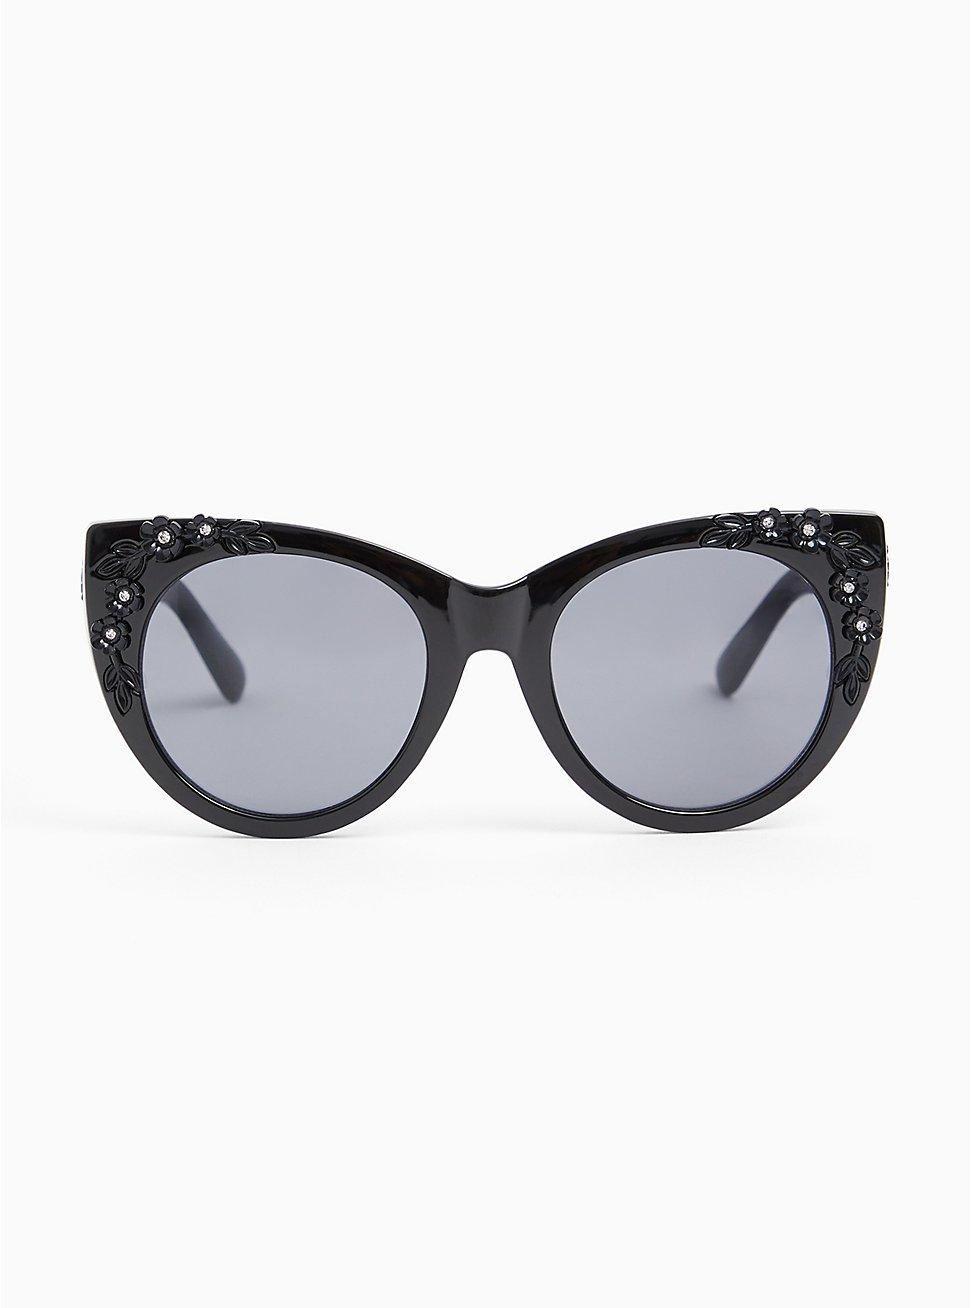 Black Floral Rhinestone Cat Eye Sunglasses, , hi-res